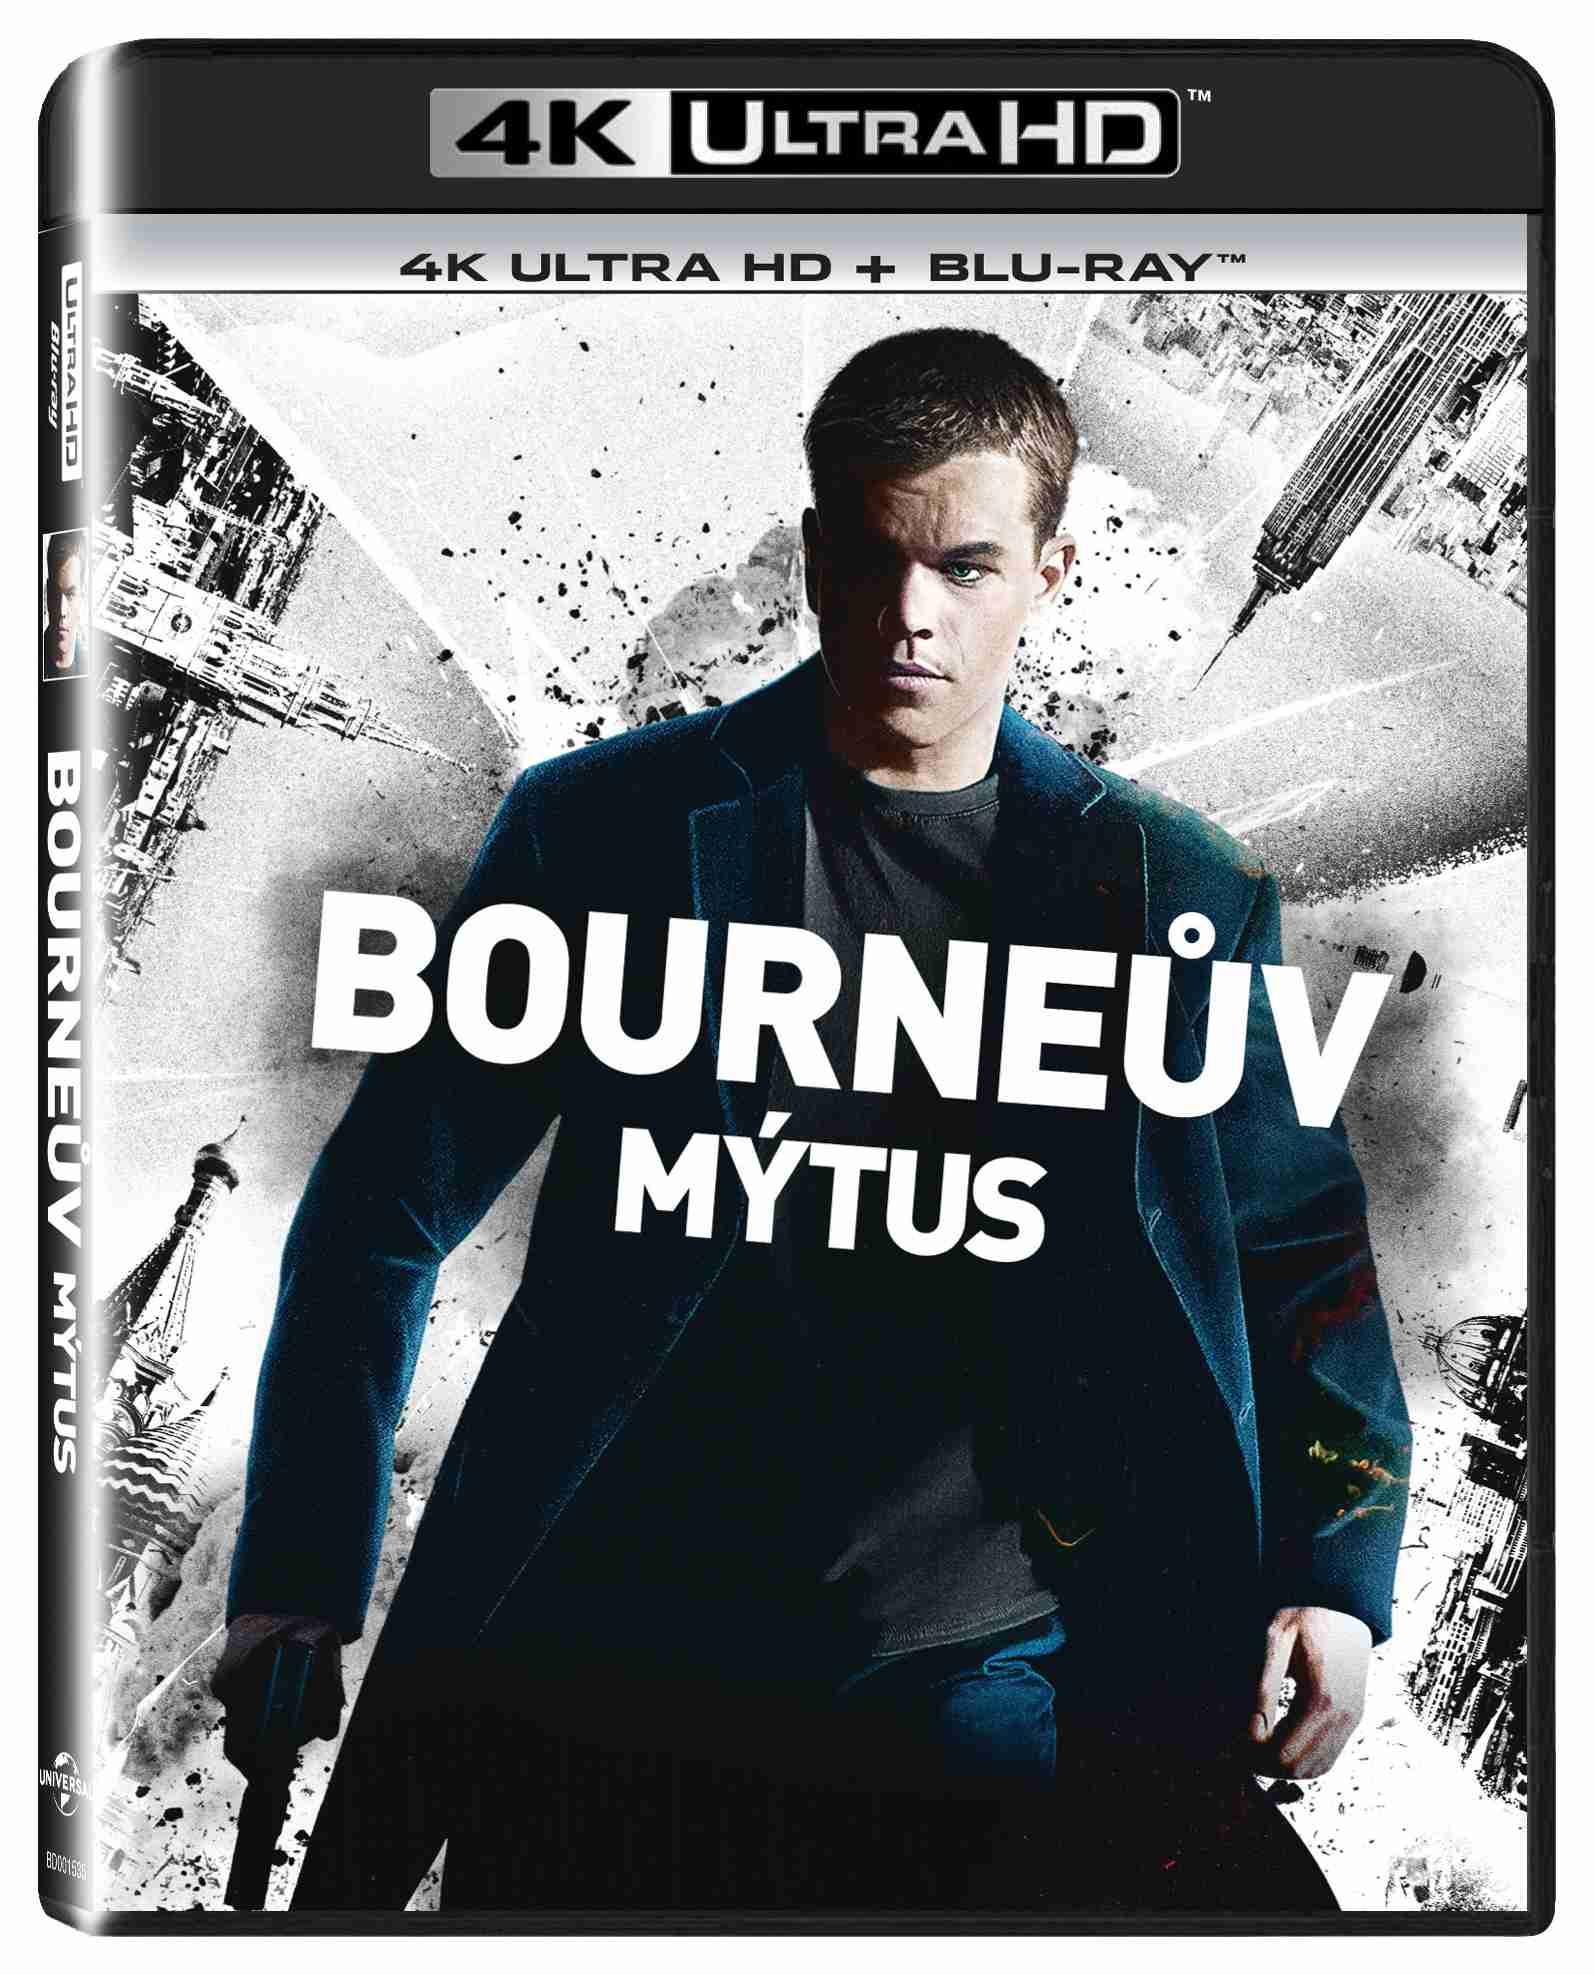 BOURNEŮV MÝTUS (4K ULTRA HD) - UHD Blu-ray + Blu-ray (2 BD)